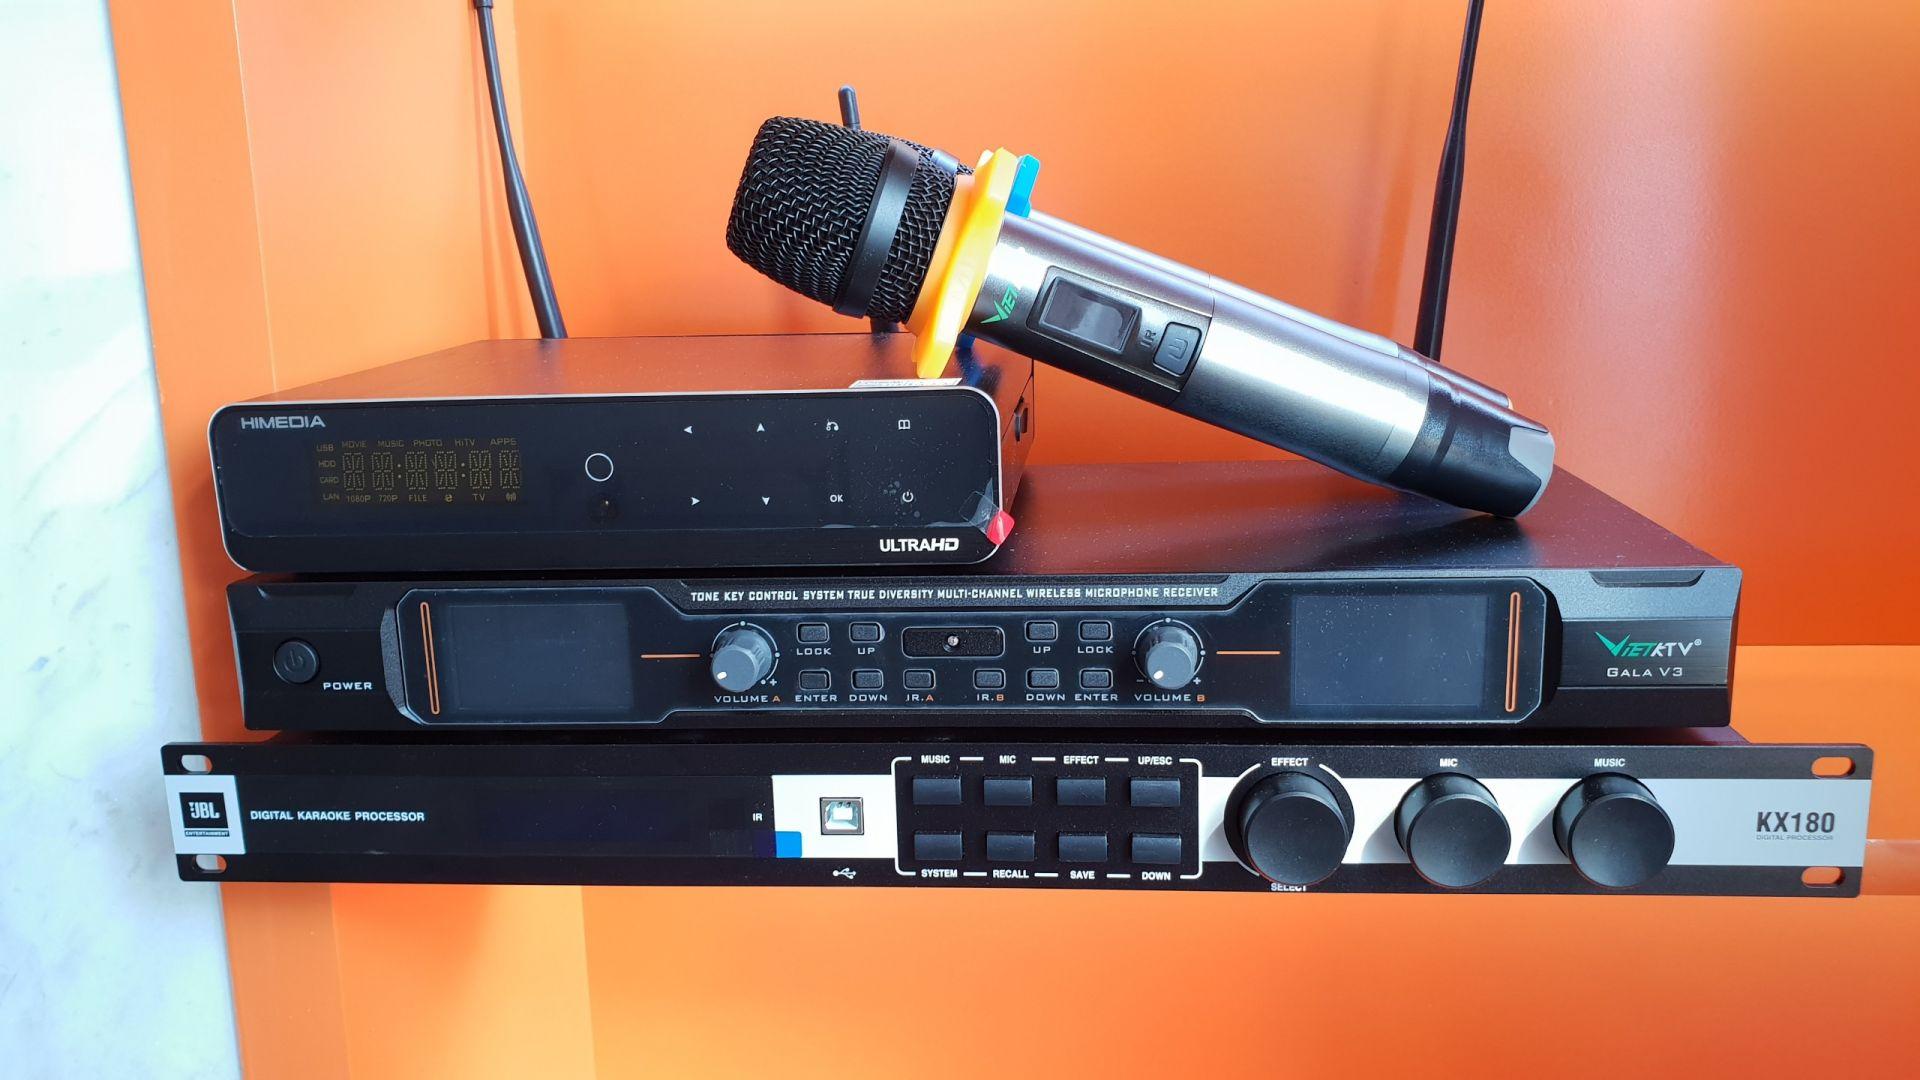 Đầu karaoke Himedia Q10 Pro trong bộ dàn TVAP 05